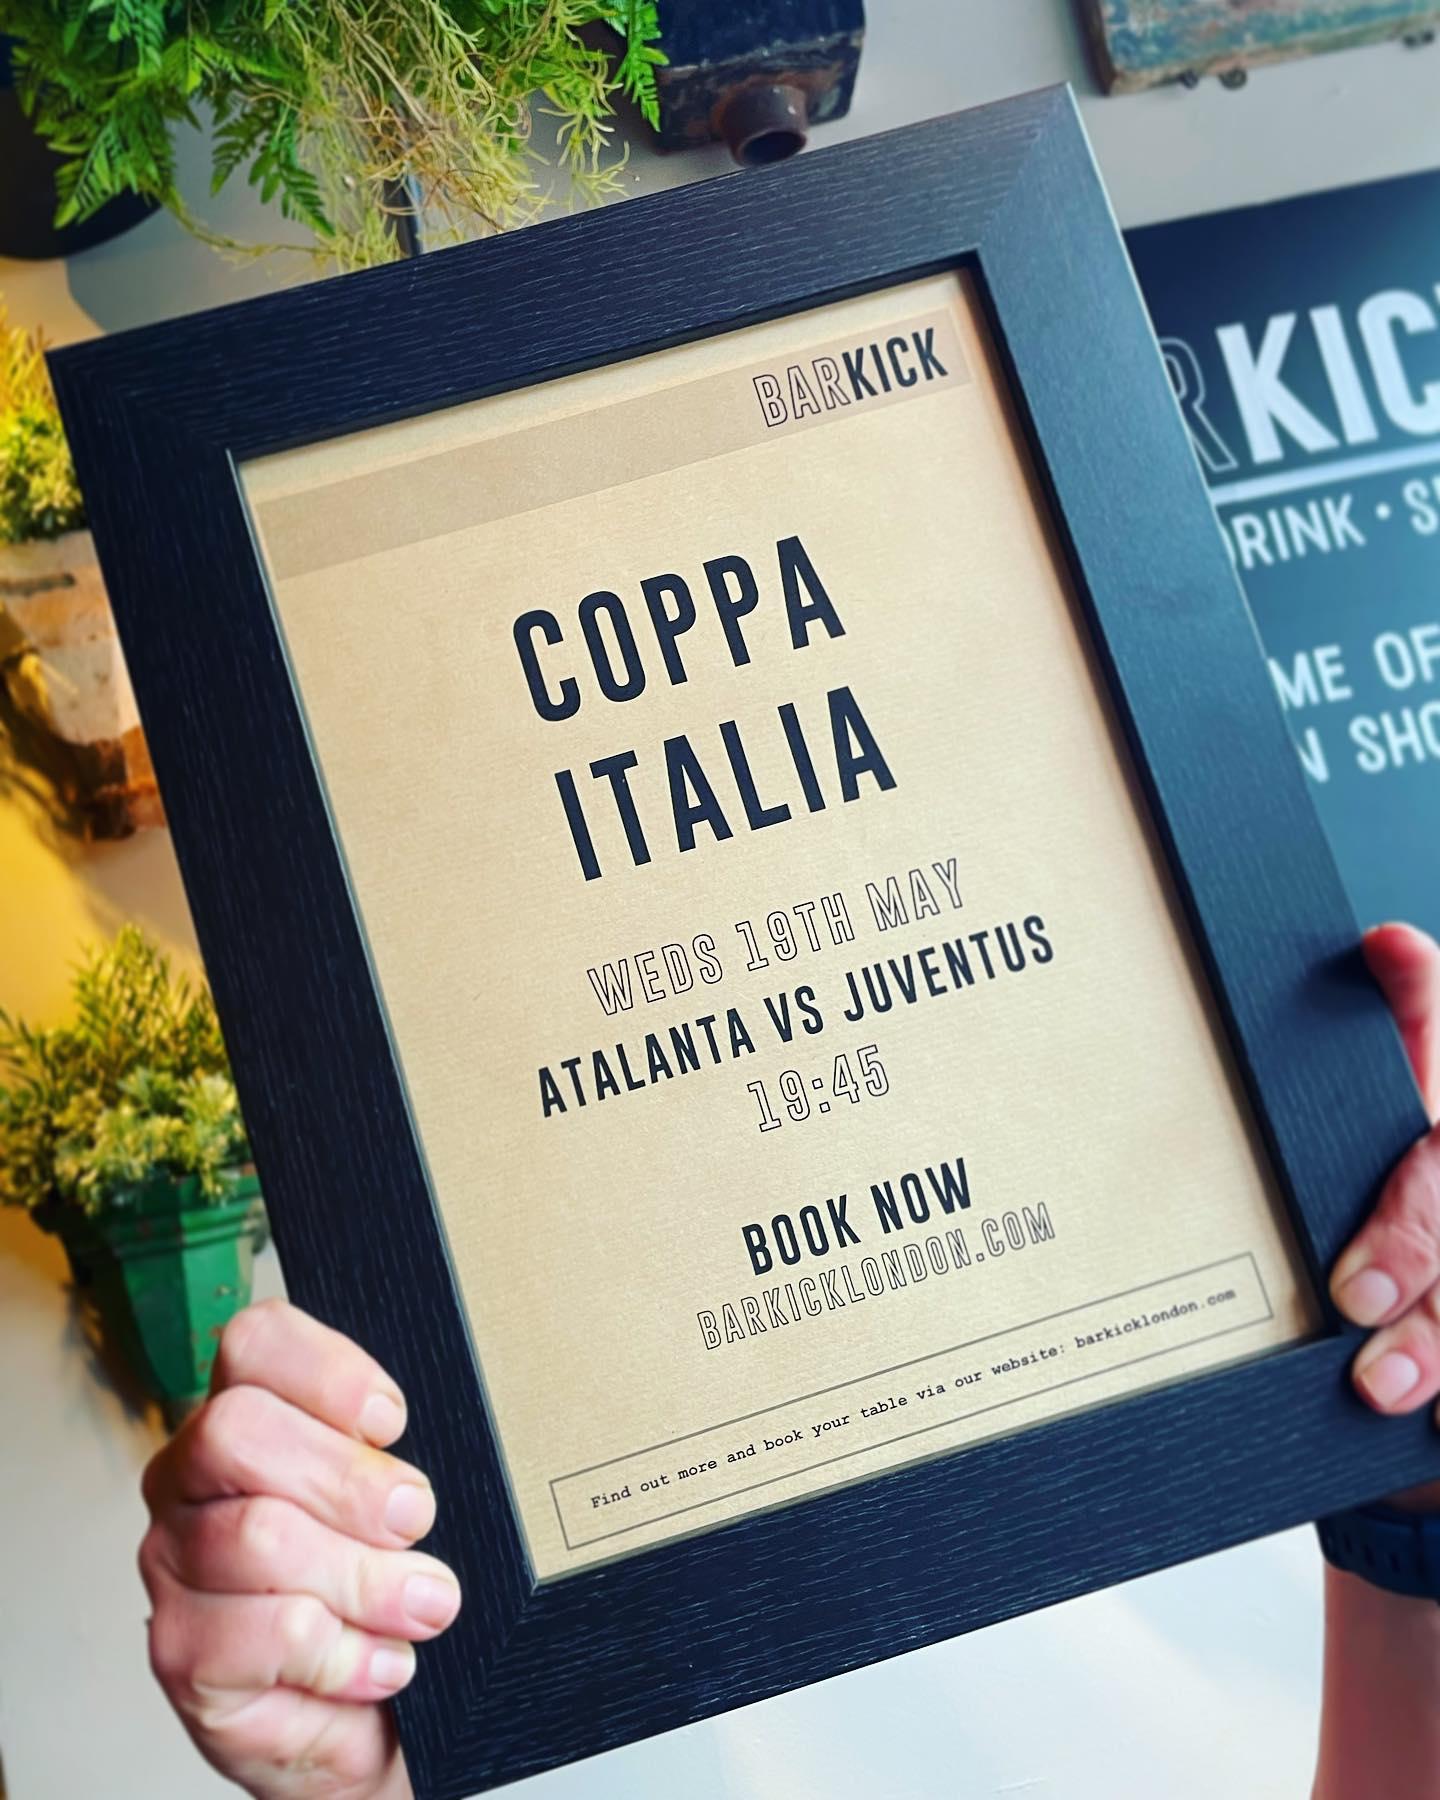 COPPA ITALIA 🏆⚽️🇮🇹  Atlanta vs Juventus Weds 19th May BOOK VIA OUR WEBSITE . . . . . #italian #italy #football #final #sport #sportsbar #footy #footballfans #barkick #shoreditch